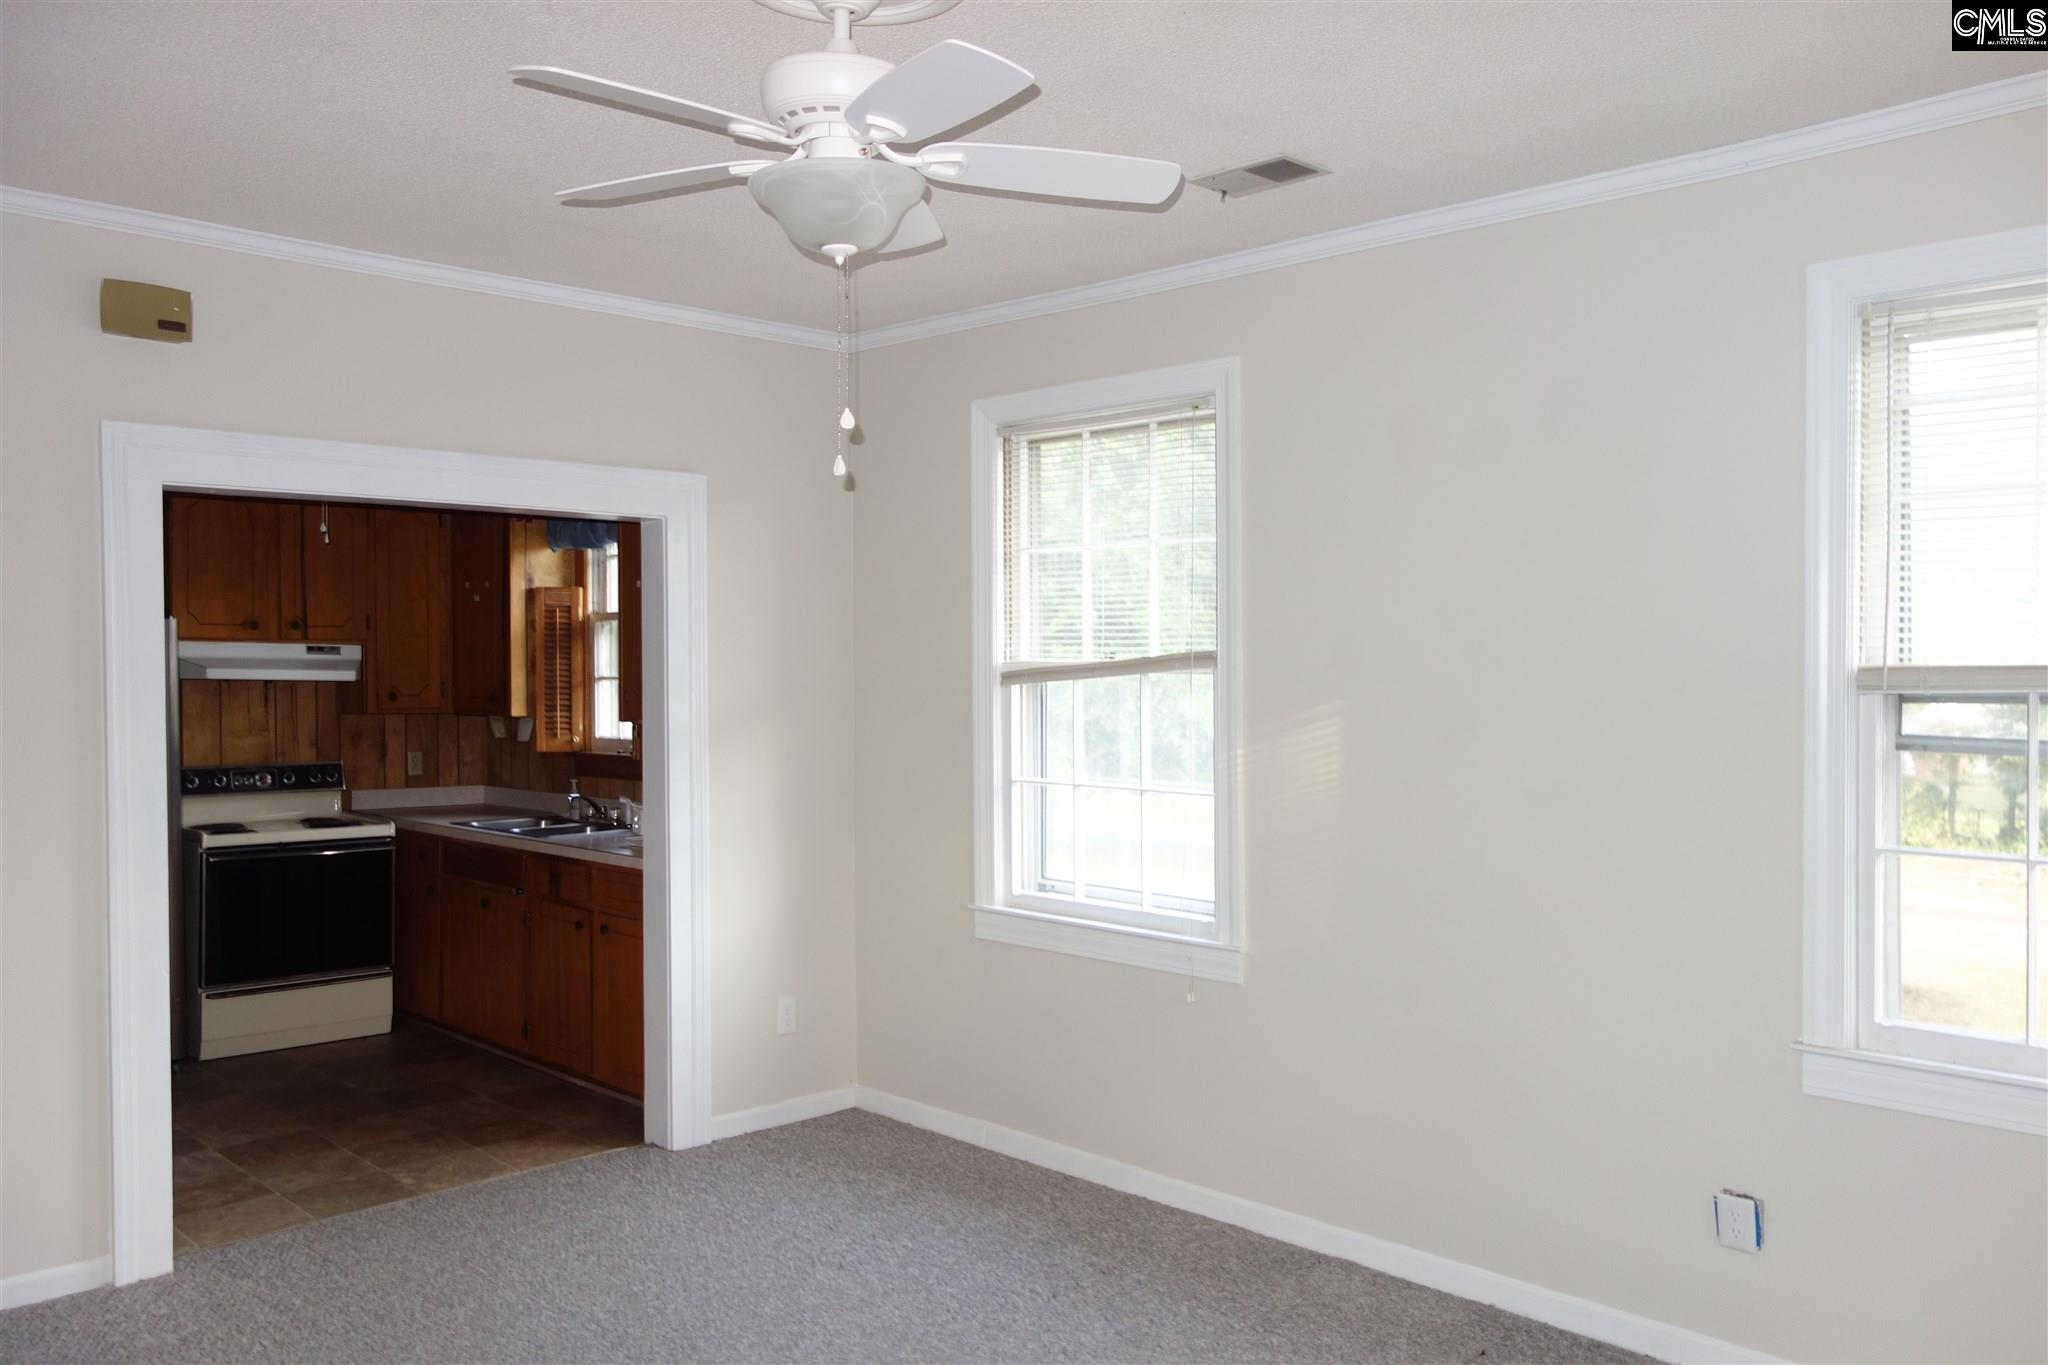 105 W High Winnsboro, SC 29180